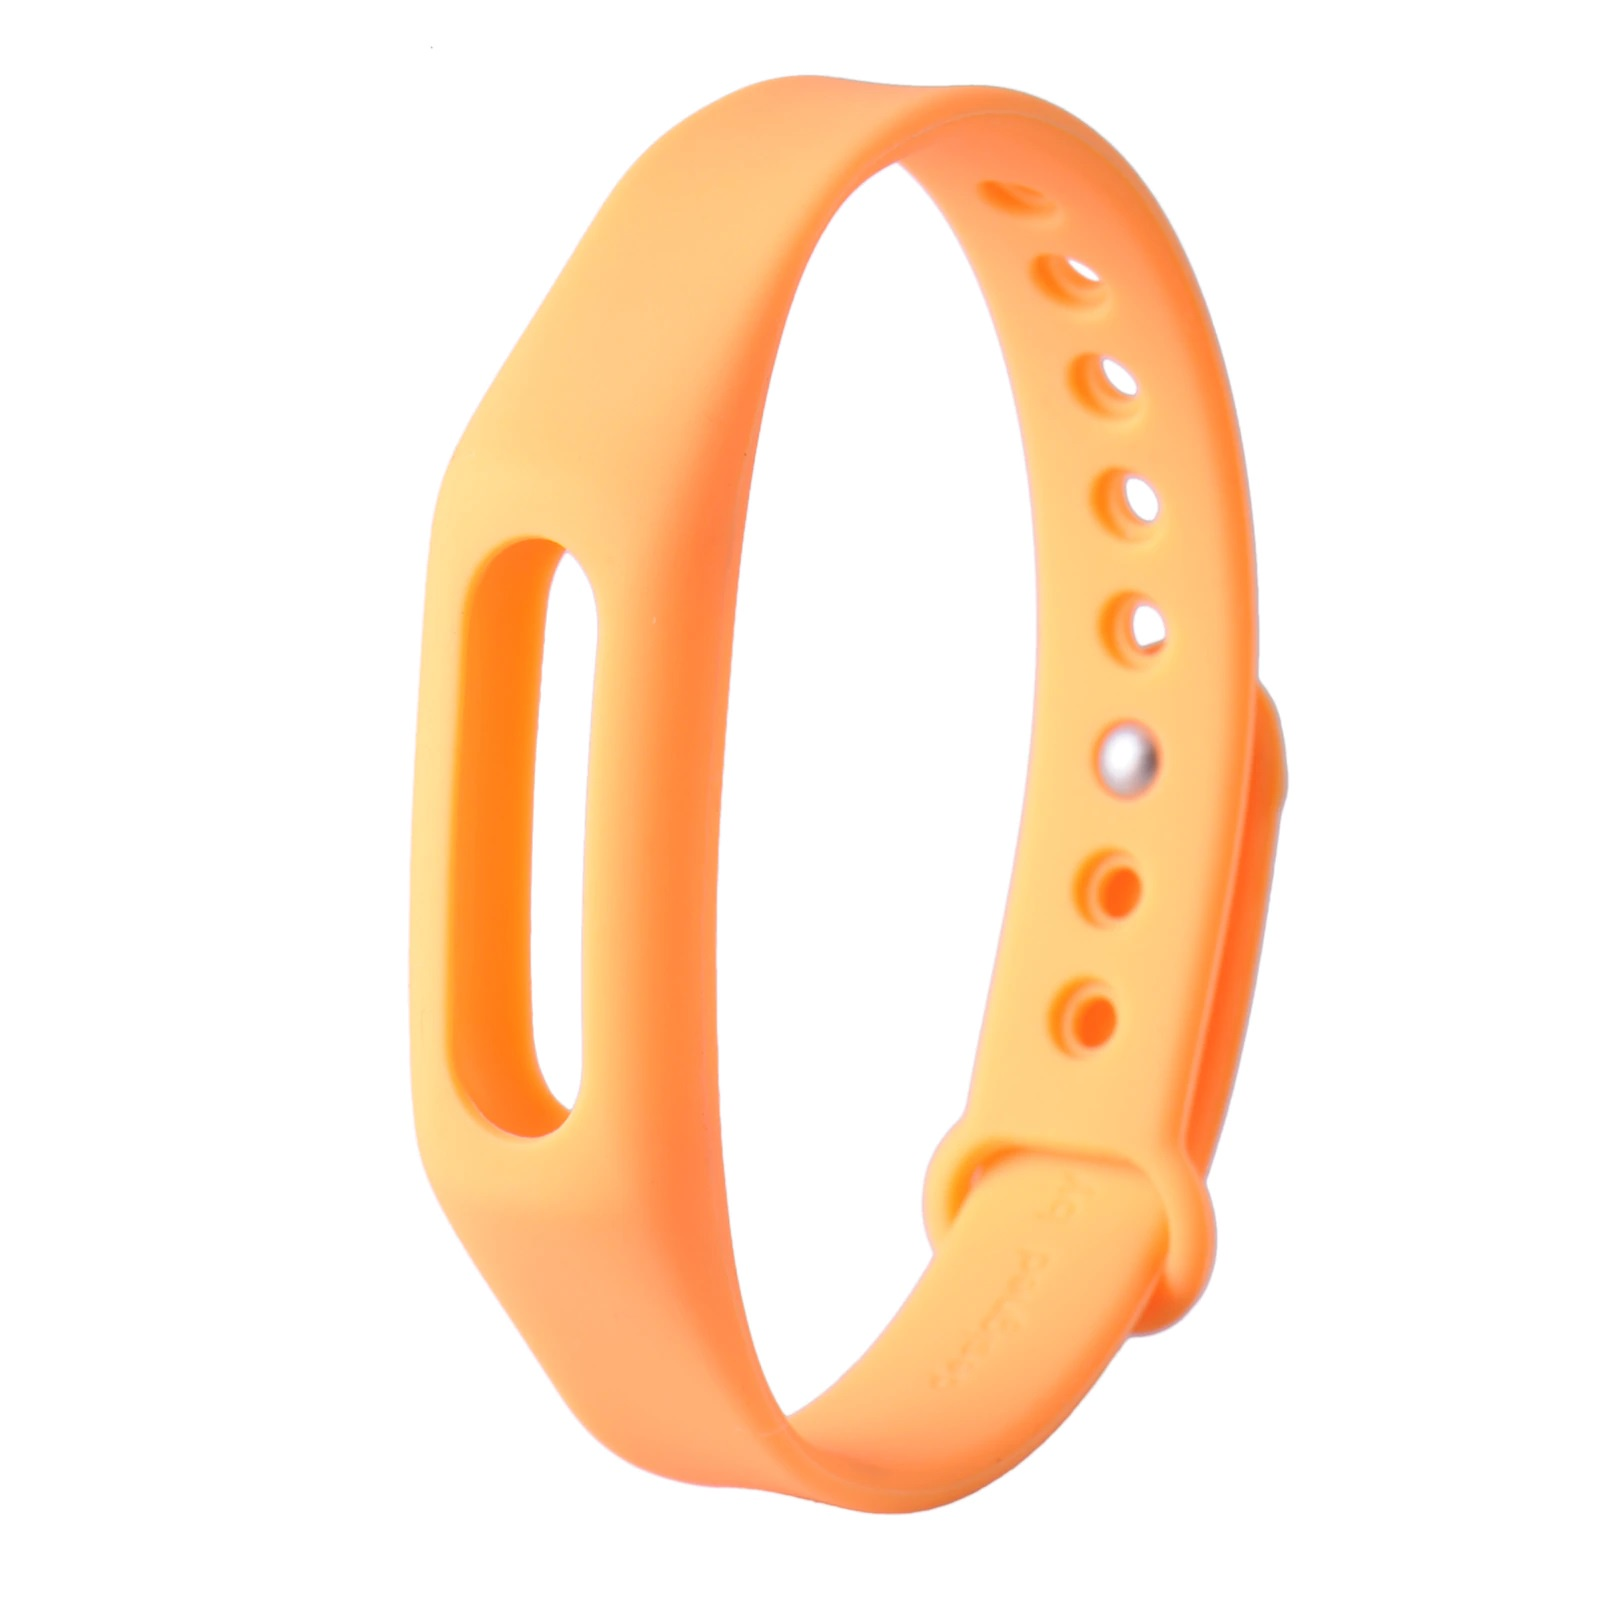 цена на Ремешок для фитнес-браслета для Xiaomi Mi Band 1 Mi Band 1S, оранжевый